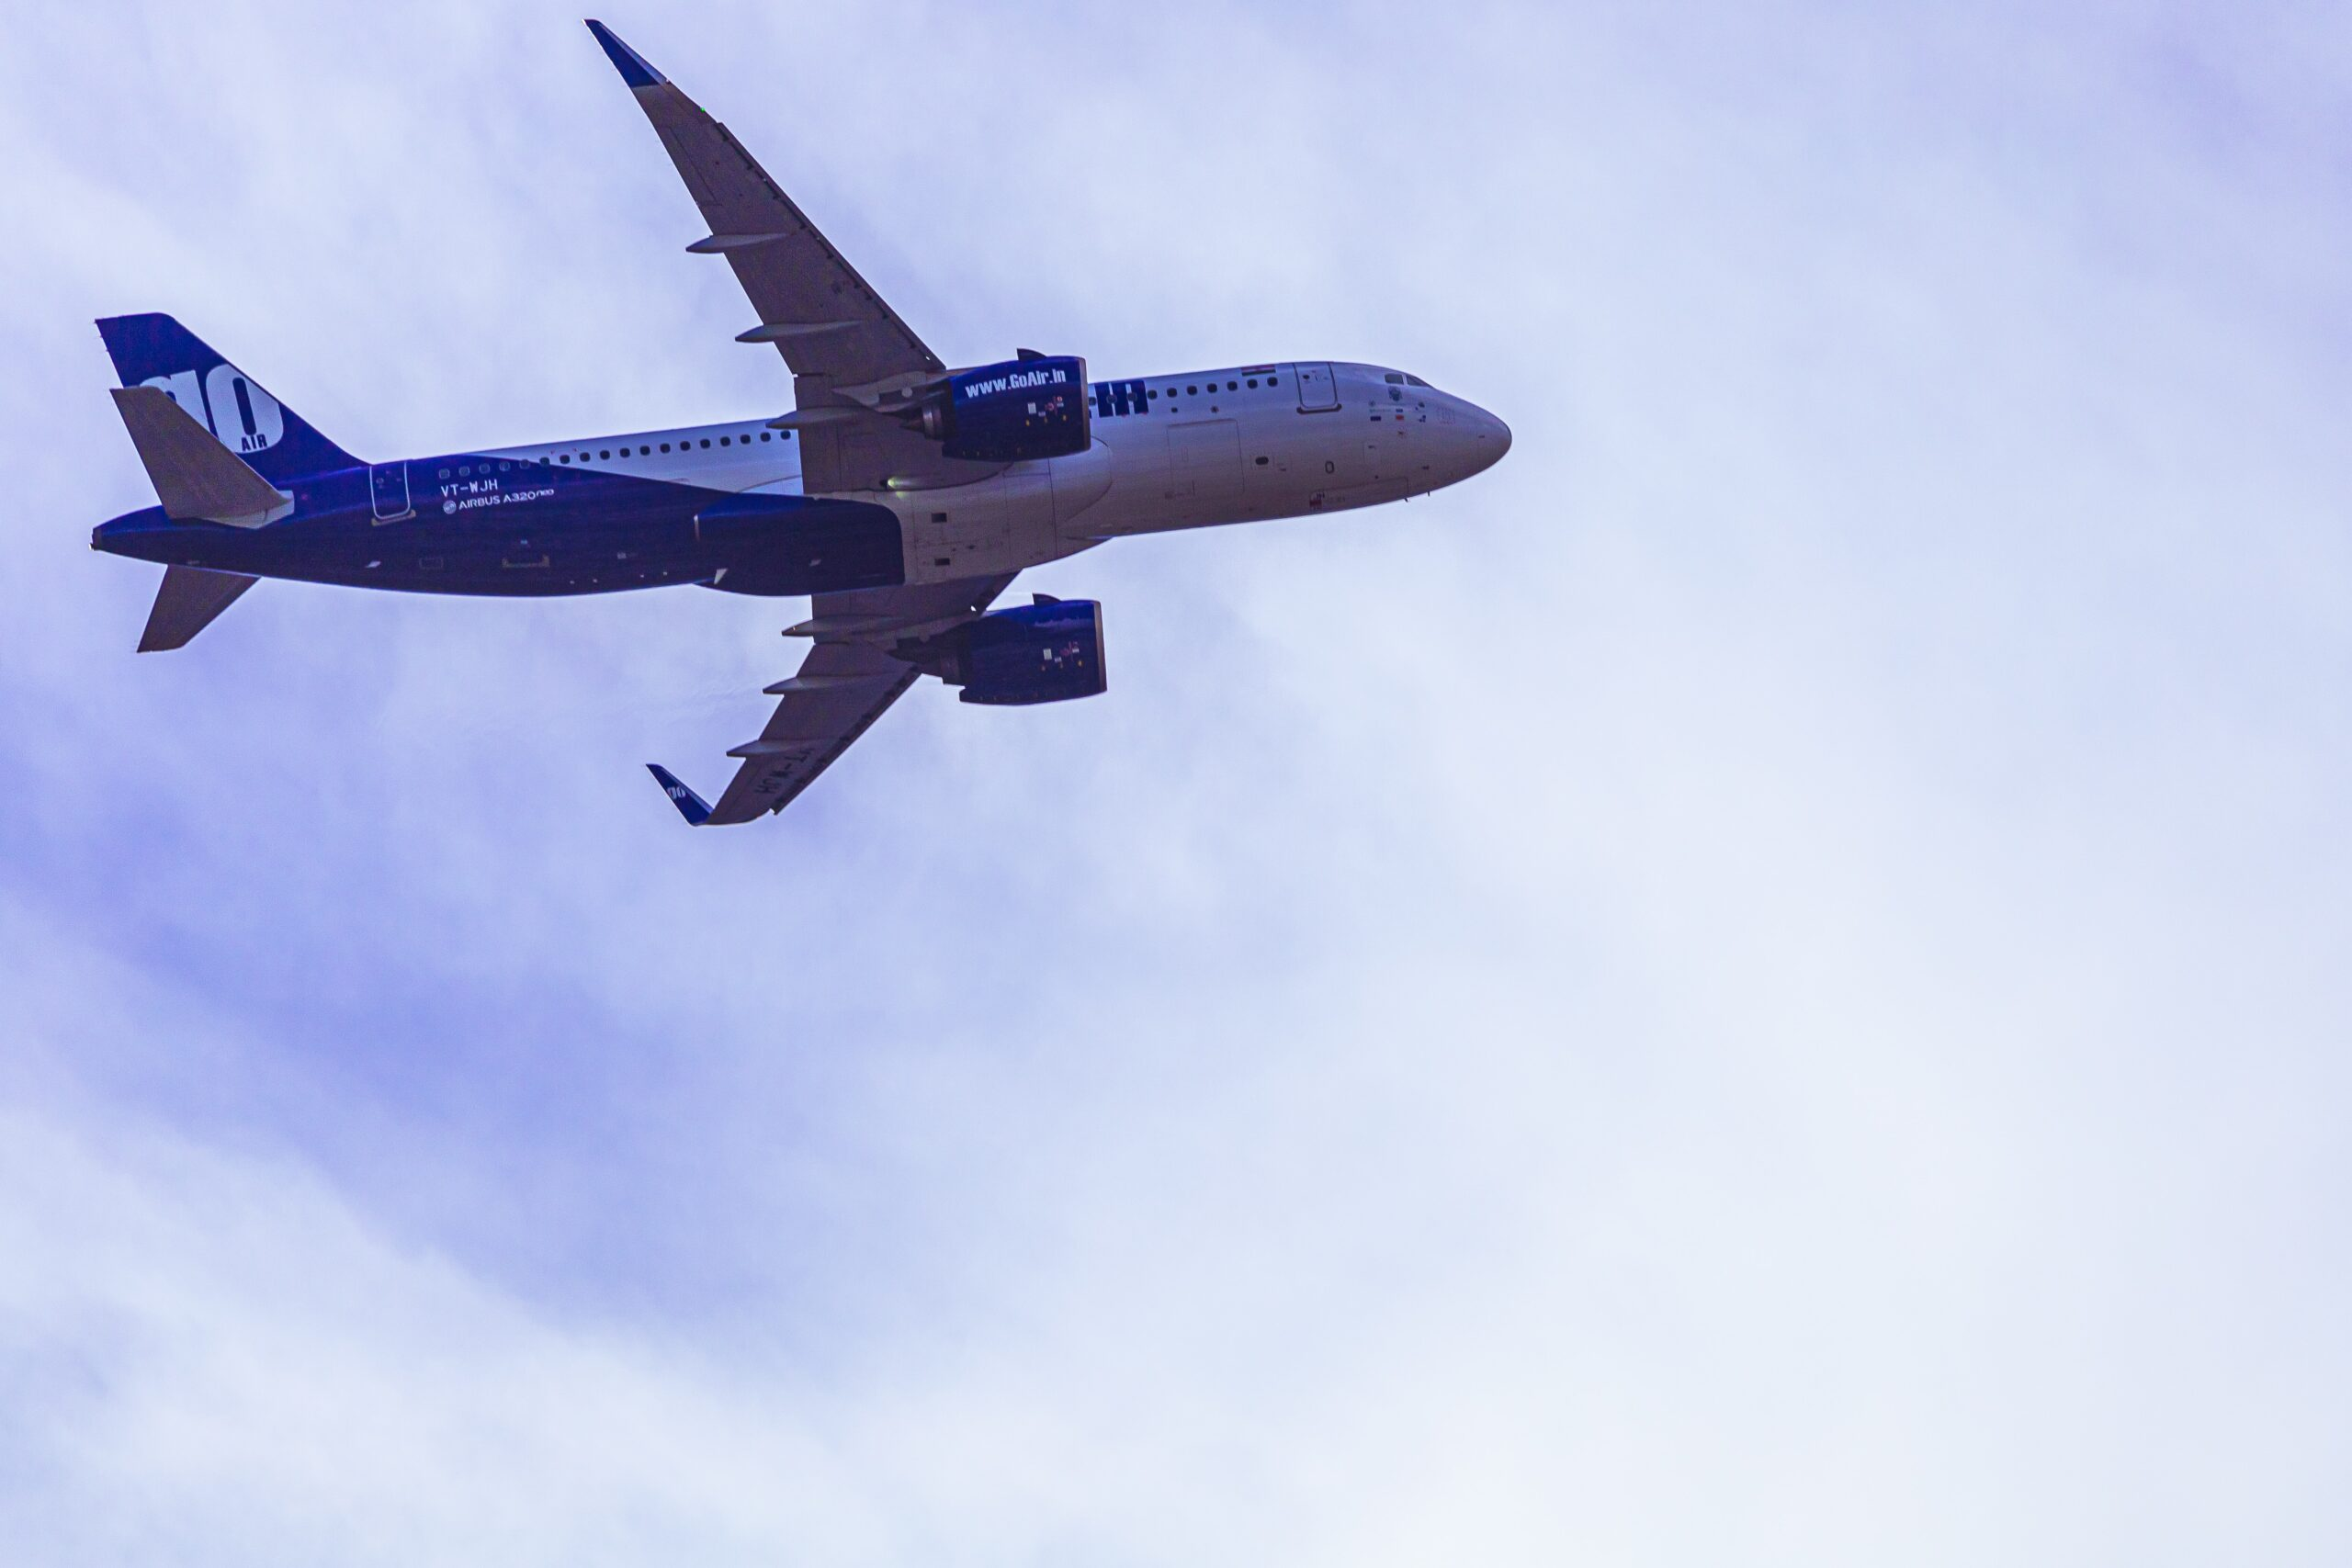 Indian Aviation Regulator Recruits More Inspectors as Downgrade Fears Loom